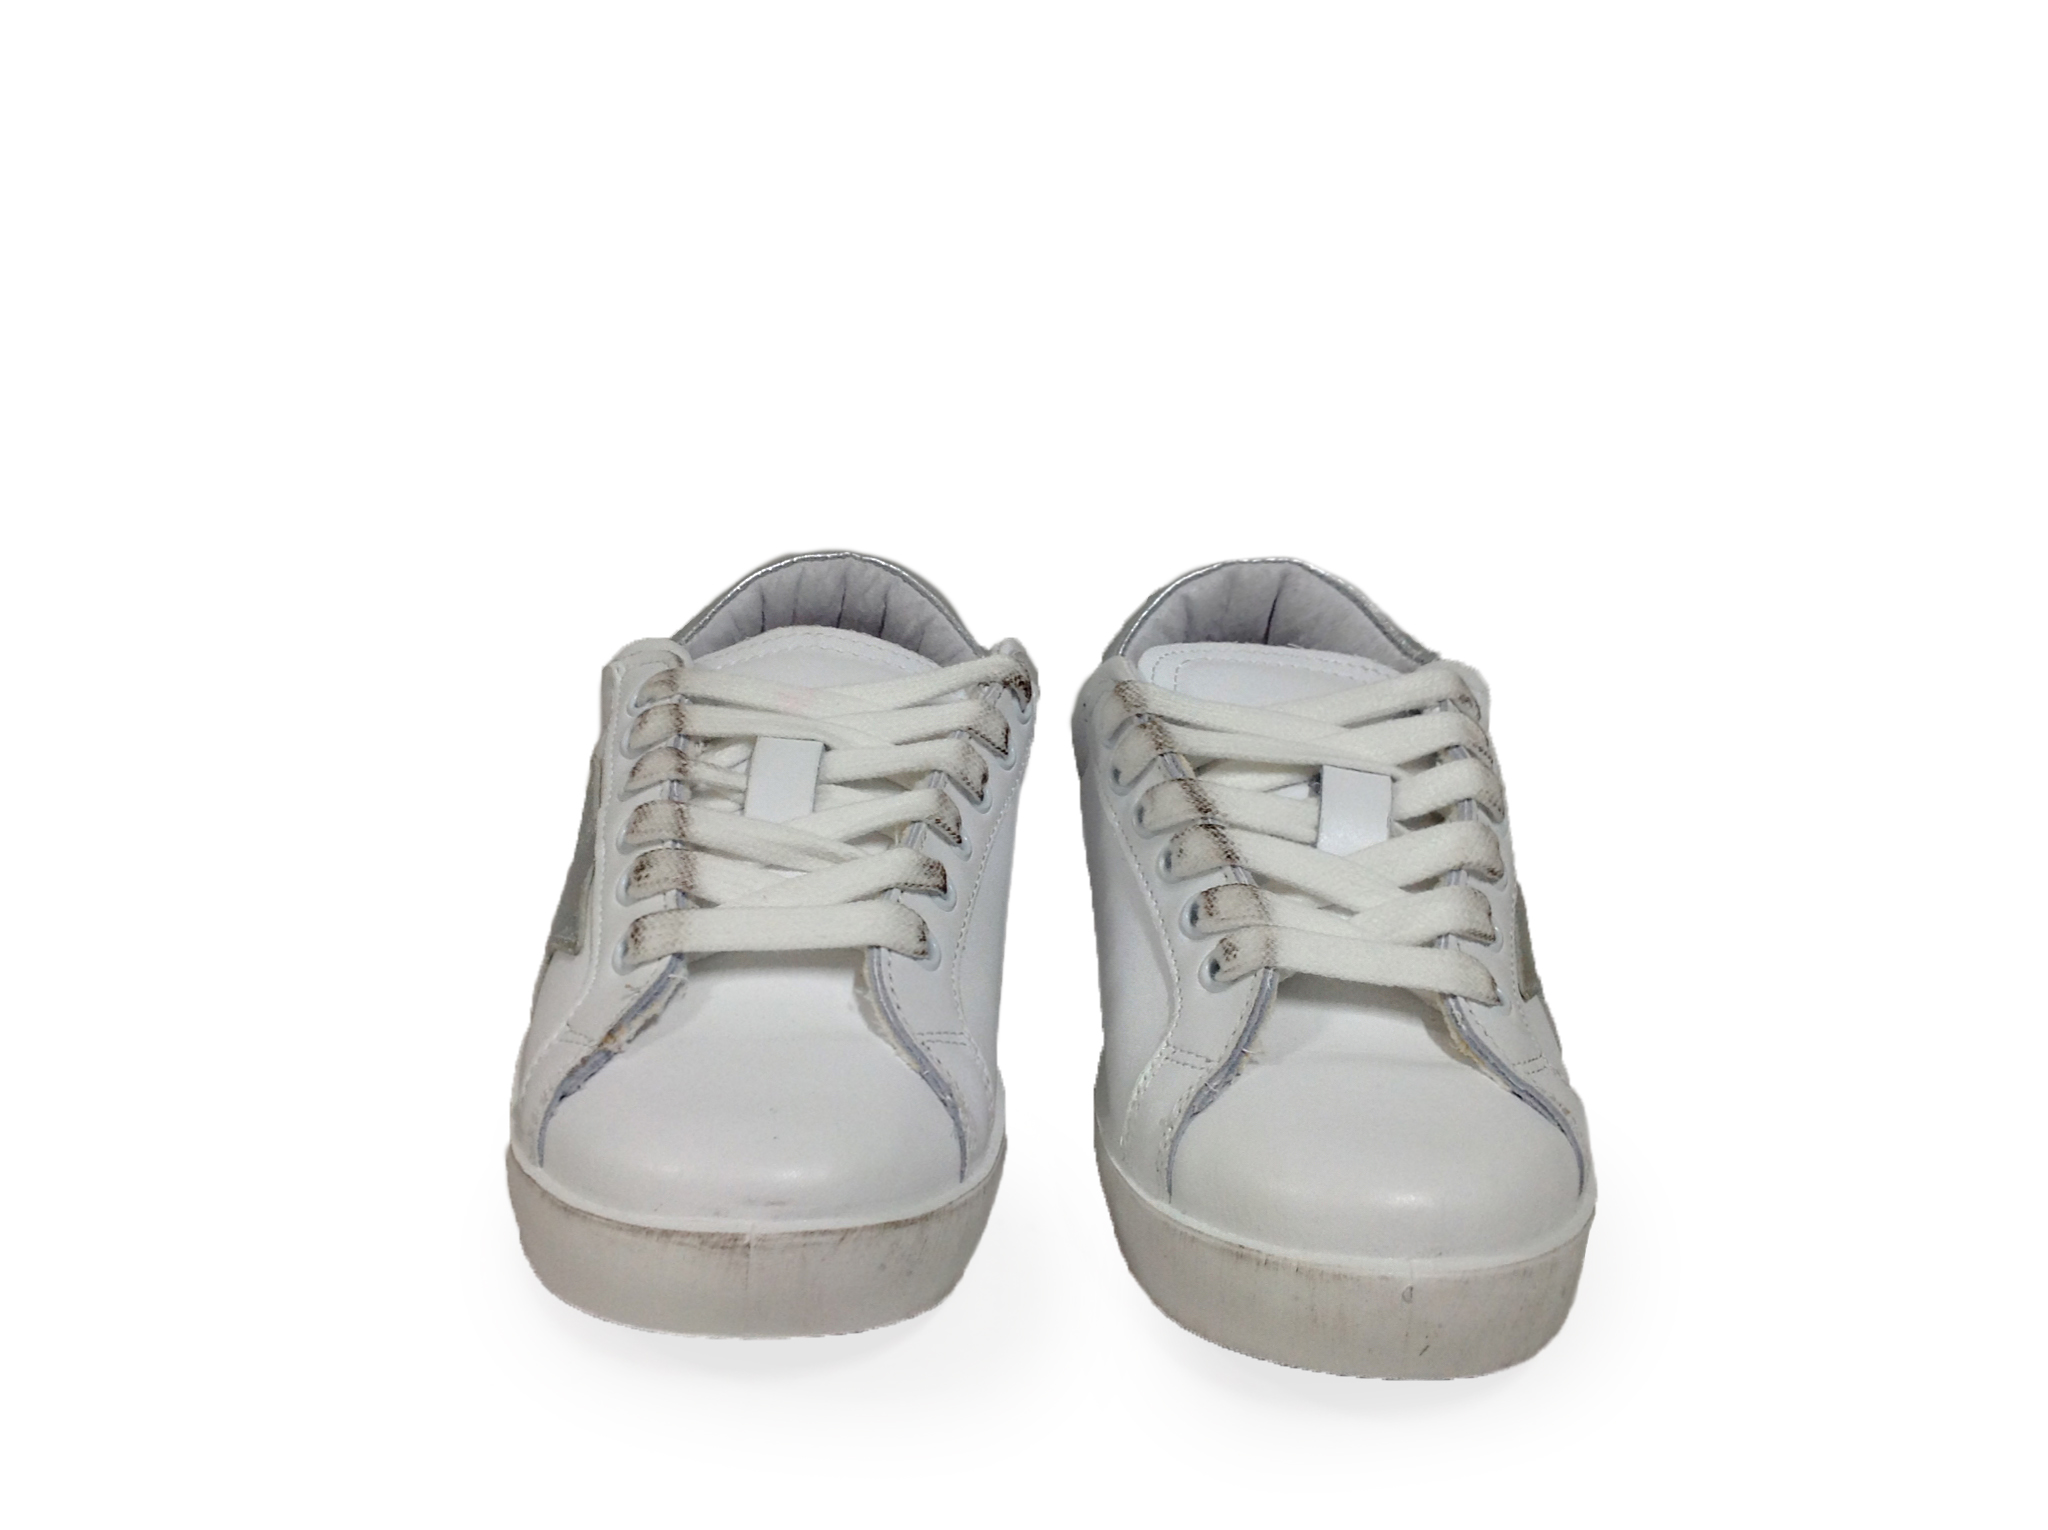 ... scarpe sneakers basse donna pelle bianca stella argento Nuovo Arish  made in ital ... 82e0cae8d80